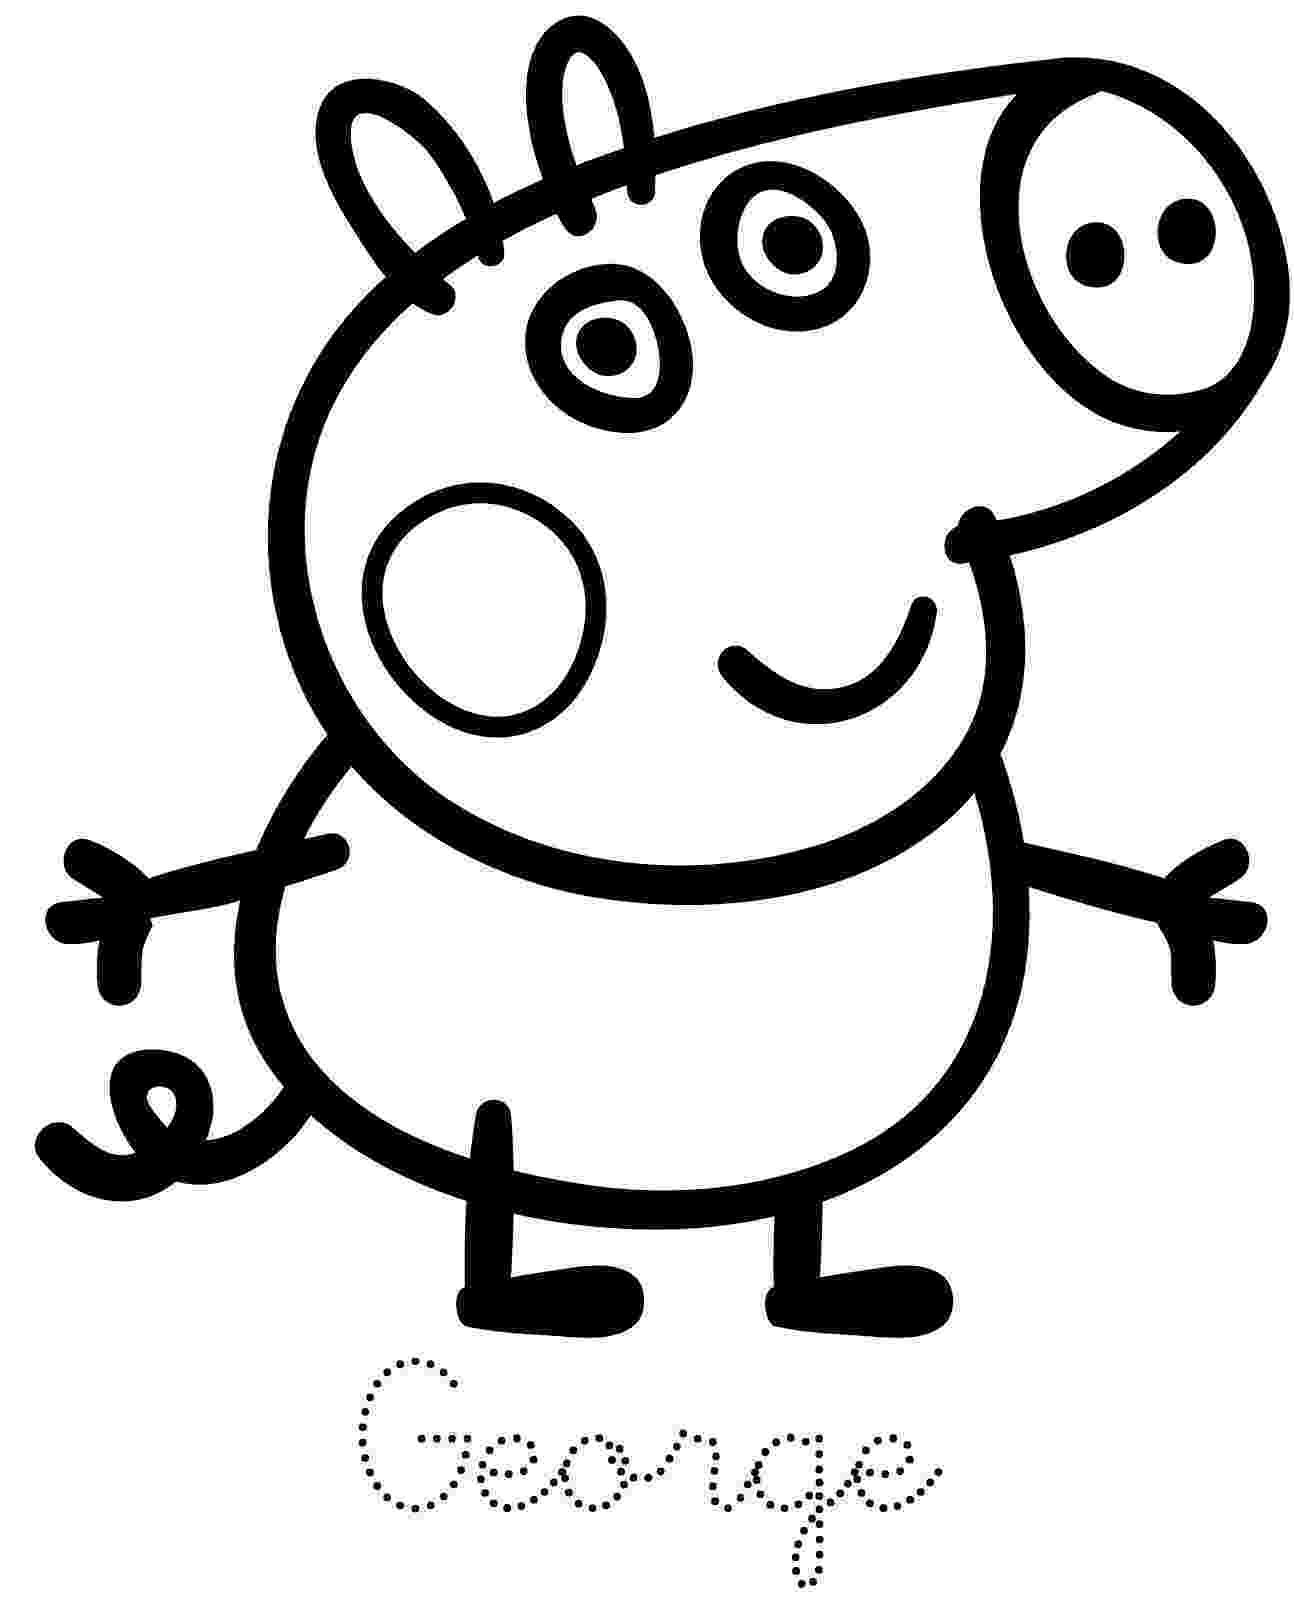 peppa pig color peppa pig coloring pages peppa pig coloring pages pig peppa color